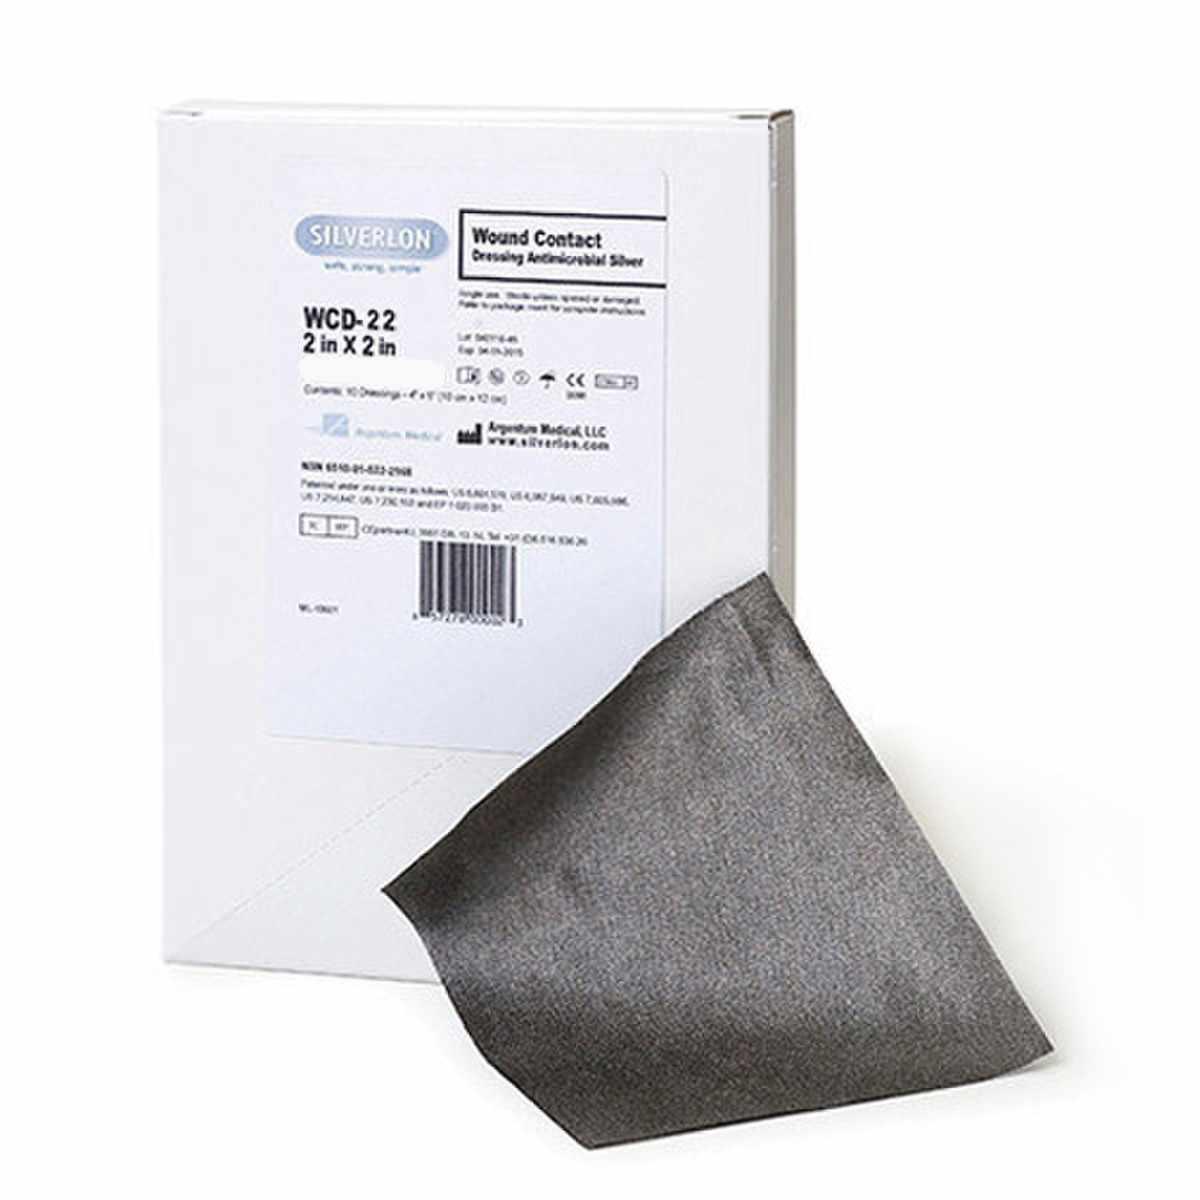 "Argentum Medical Silverlon Wound Contact Dressing 2"" x 2"""